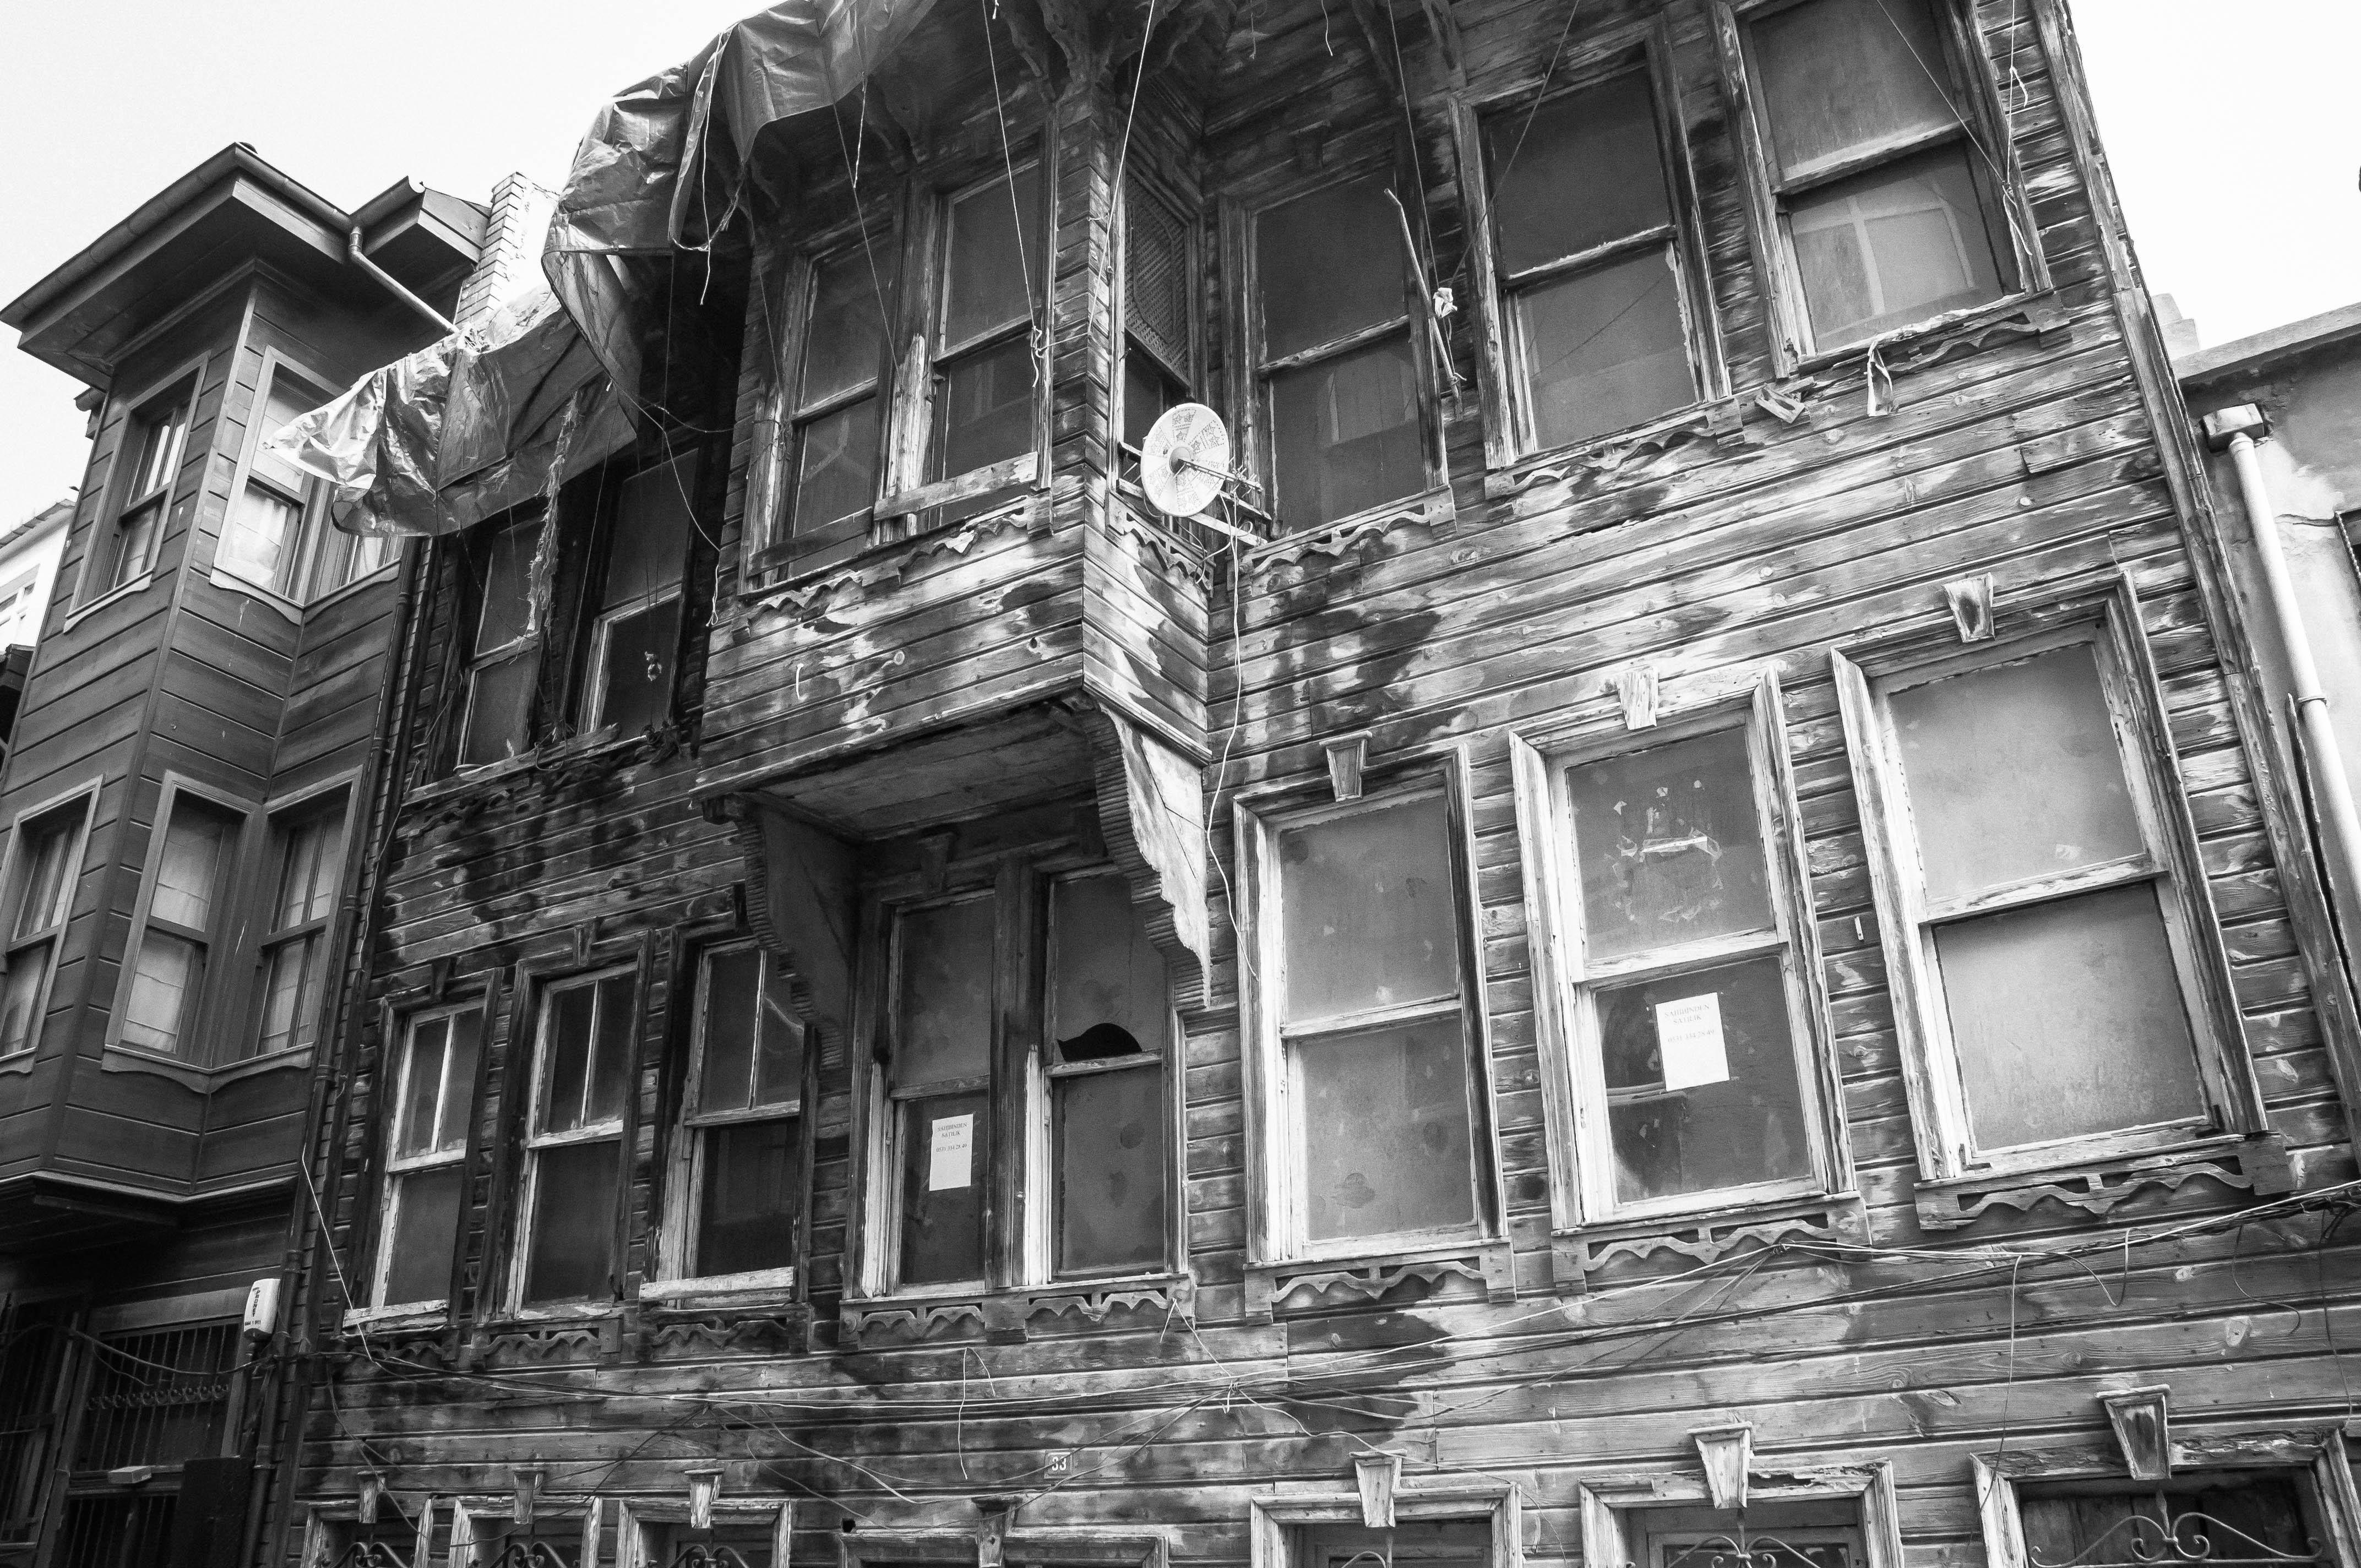 Flickr - Schegge di Istanbul, Fathi